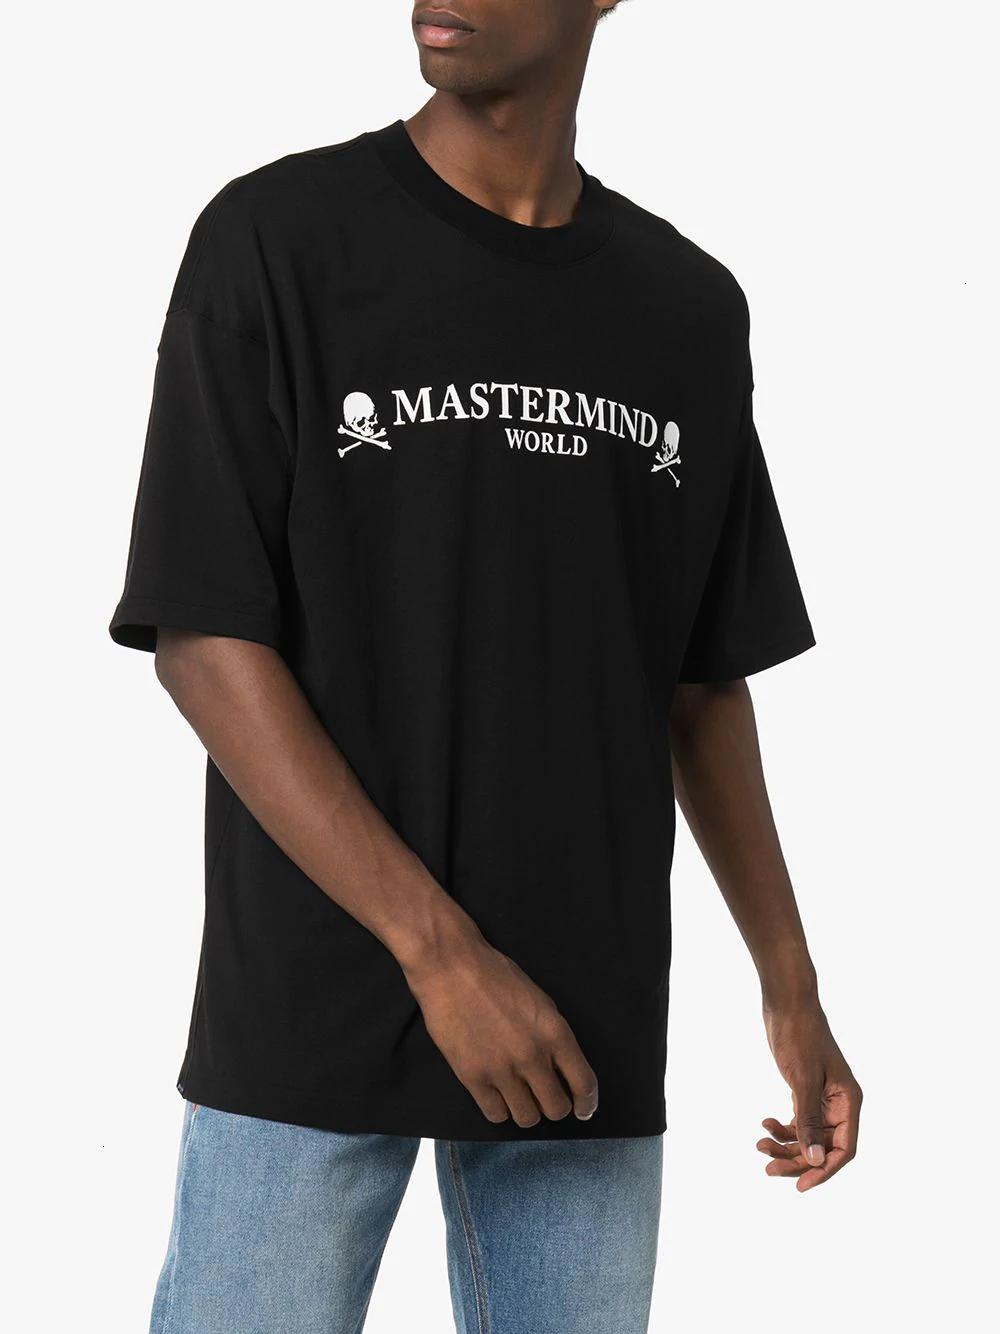 2020 Europea Fashion Tide Round Collar Printing Of Skull Cotton Shirt For Men Clothing mens 11281